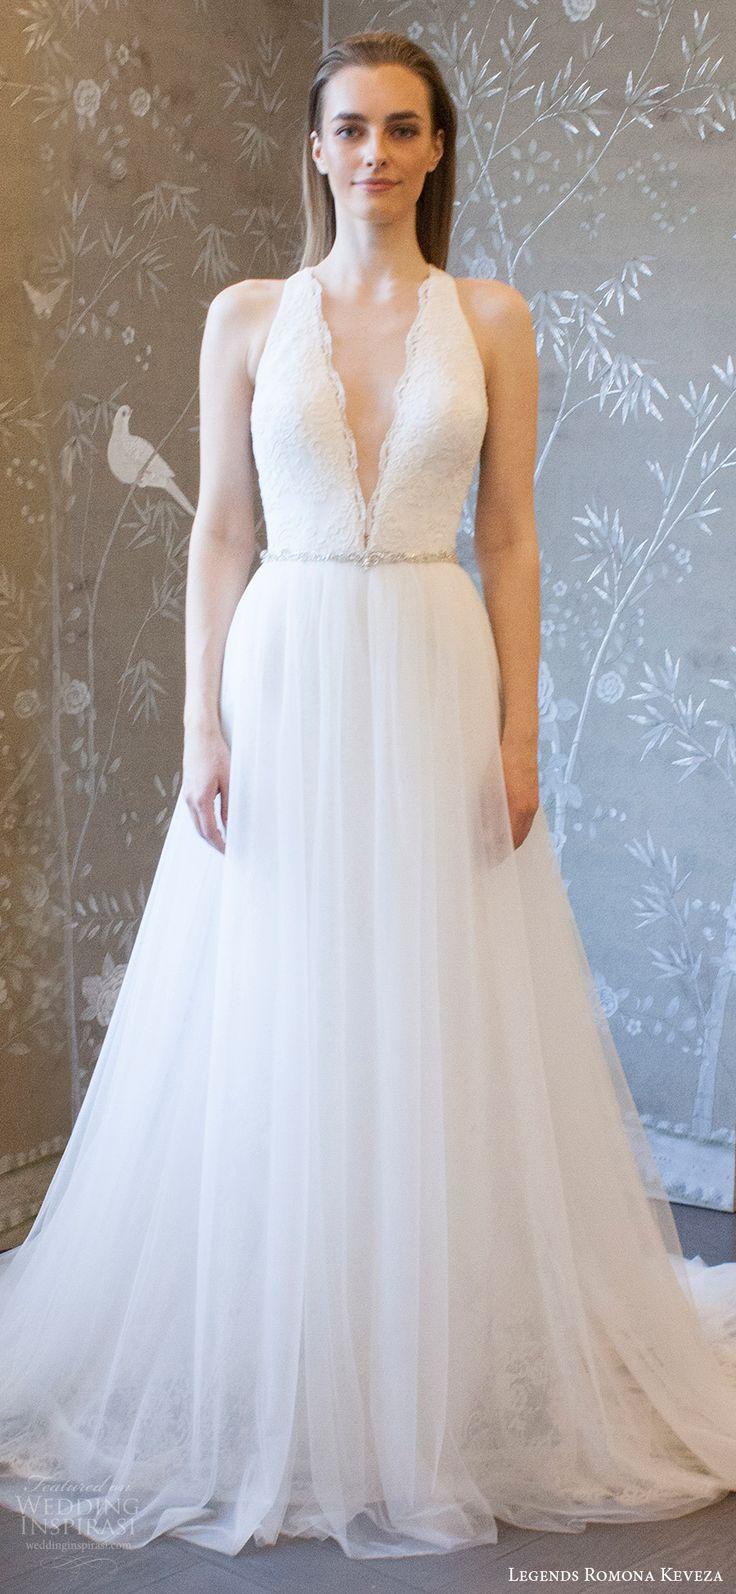 Stunning Legends Romona Keveza Spring Wedding Dresses